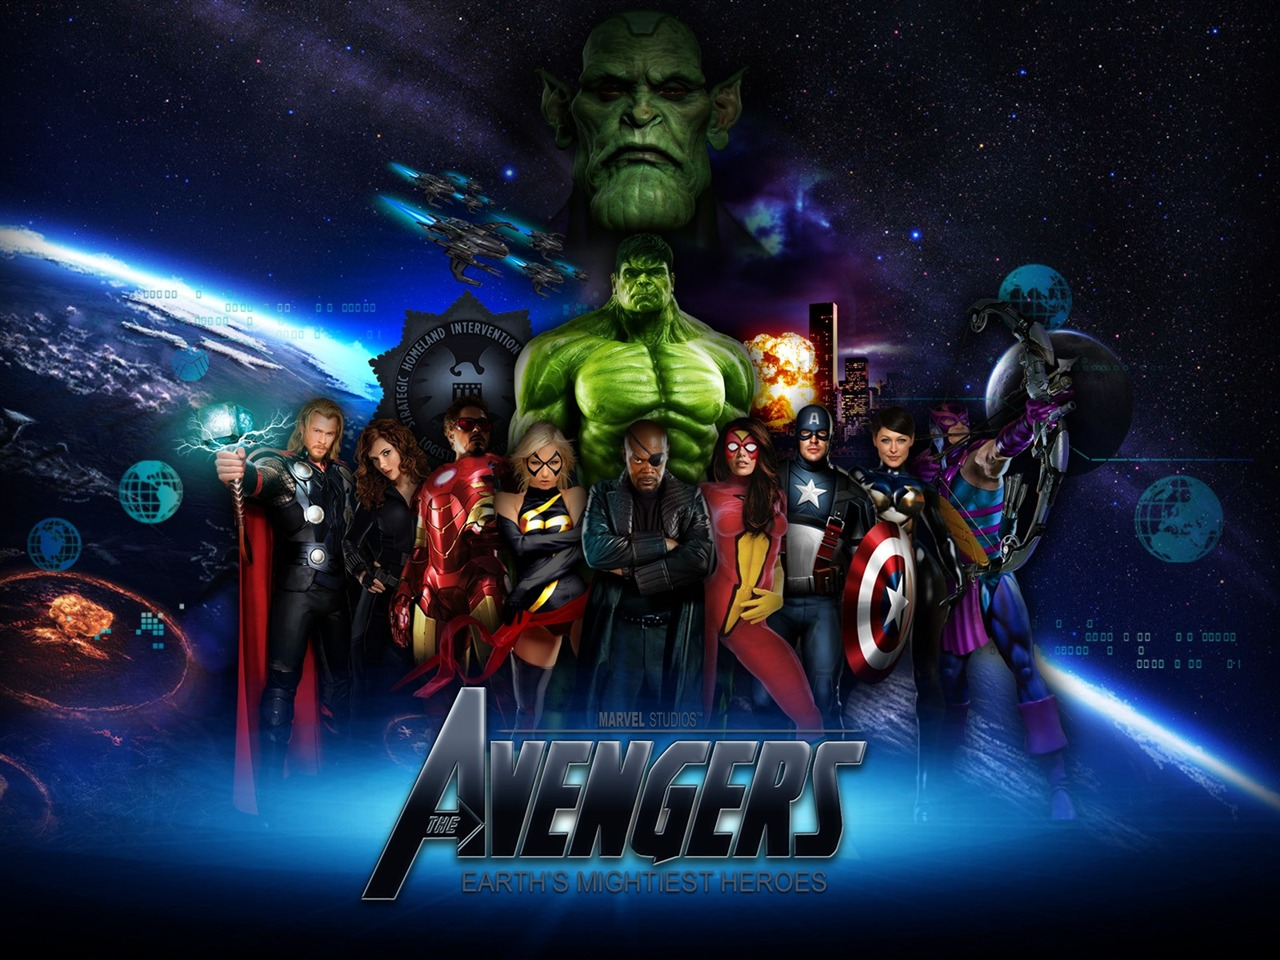 the avengers 2012 hd movie desktop wallpaper 09 1280x960